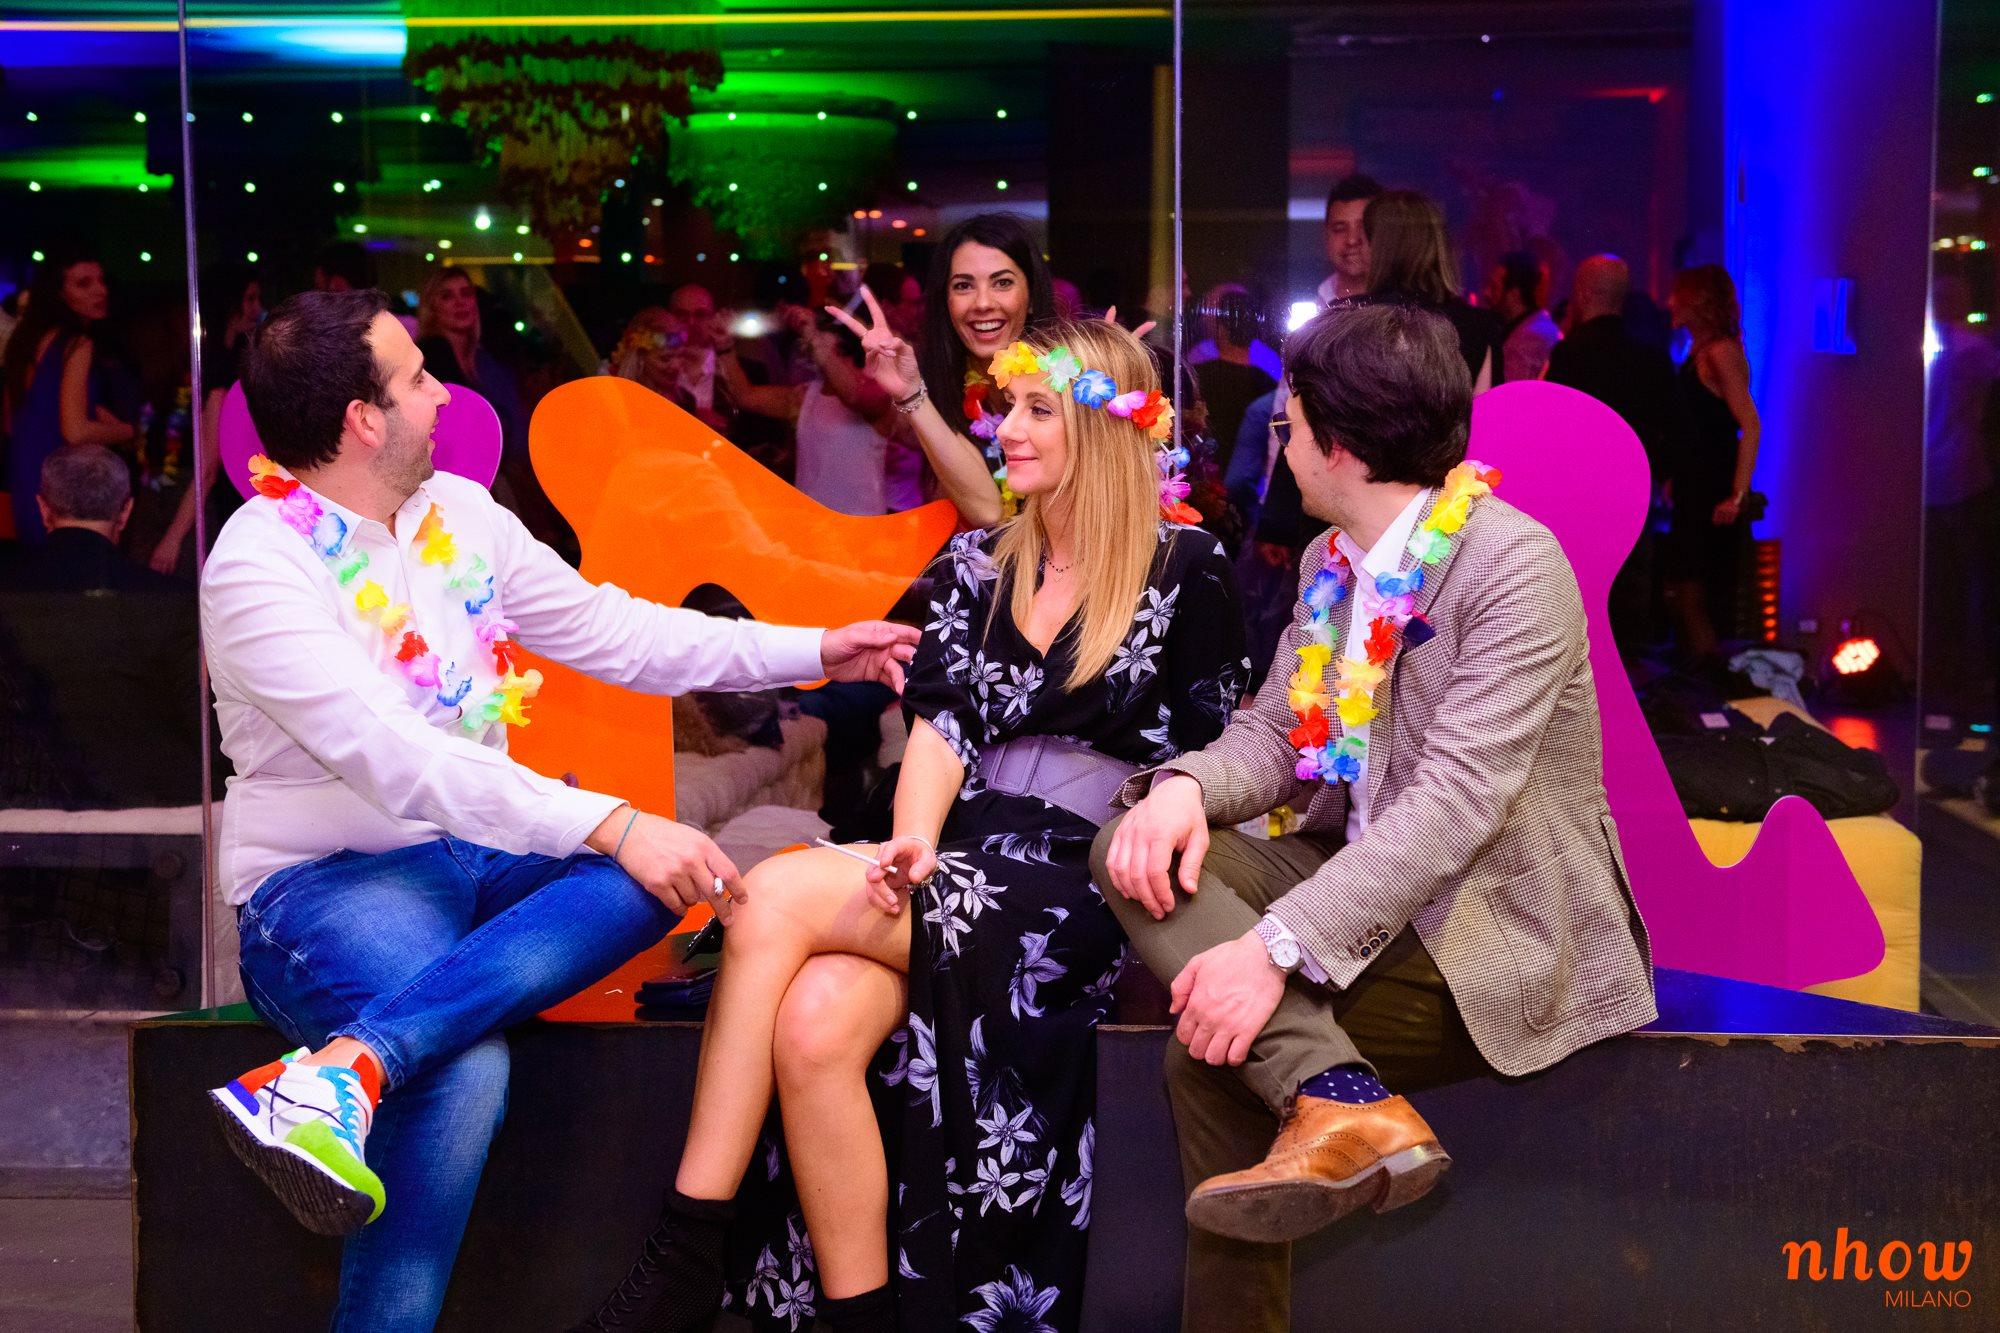 Hotel Cocktail Party - Maledetta Primavera / Spring Party | YOUparti nhow tortona